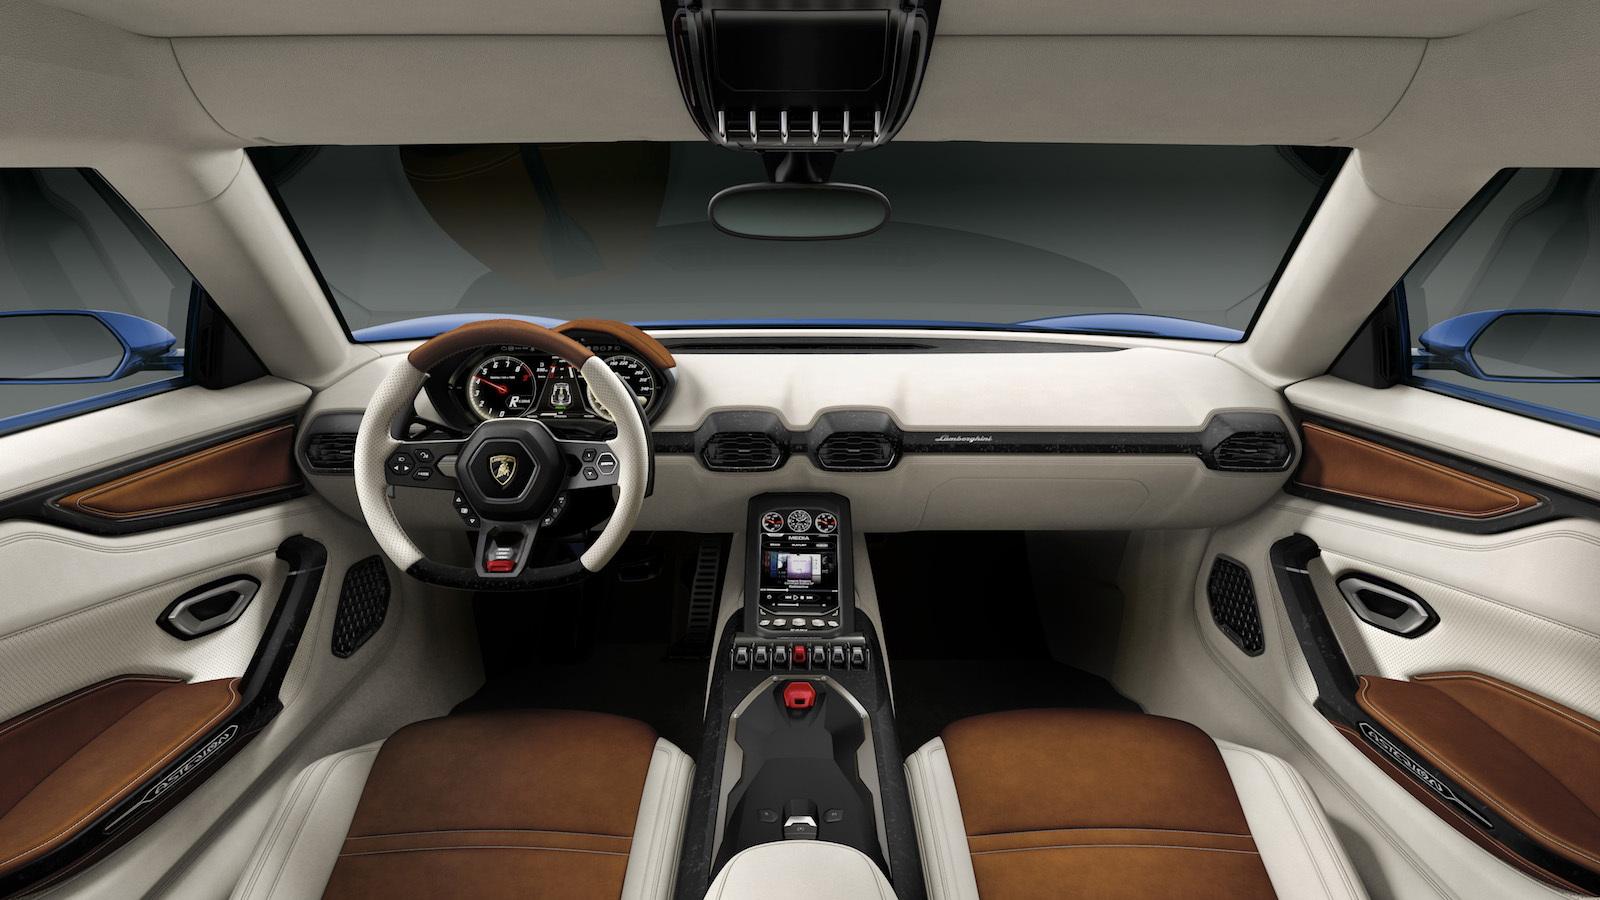 Lamborghini Asterion Lpi 910 4 Full Details Live Photos 2014